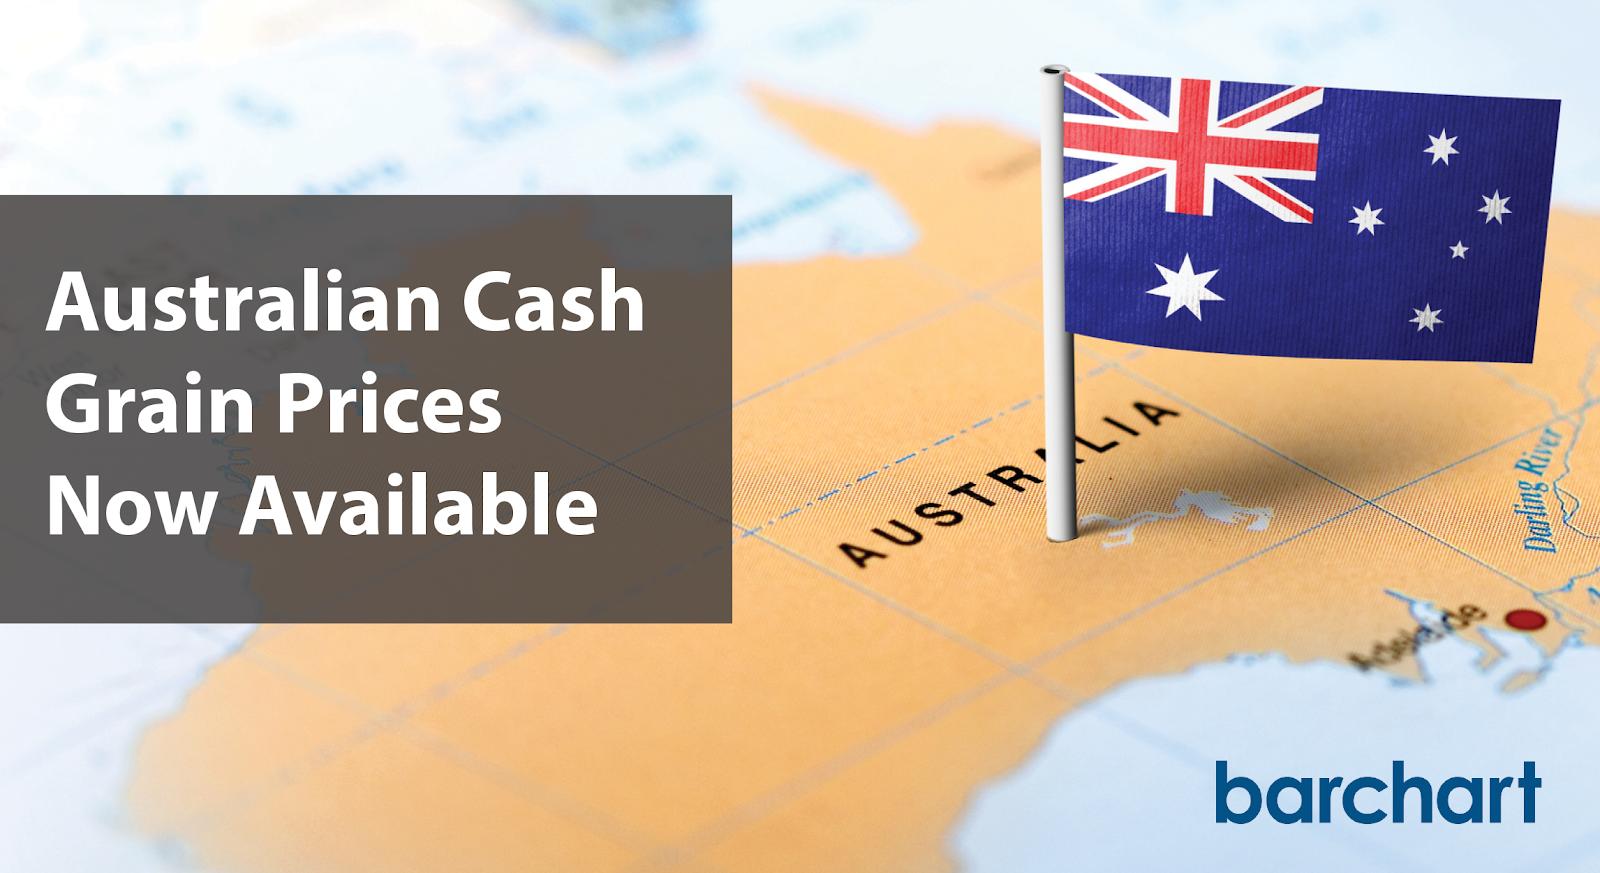 Australian Cash Grain Prices